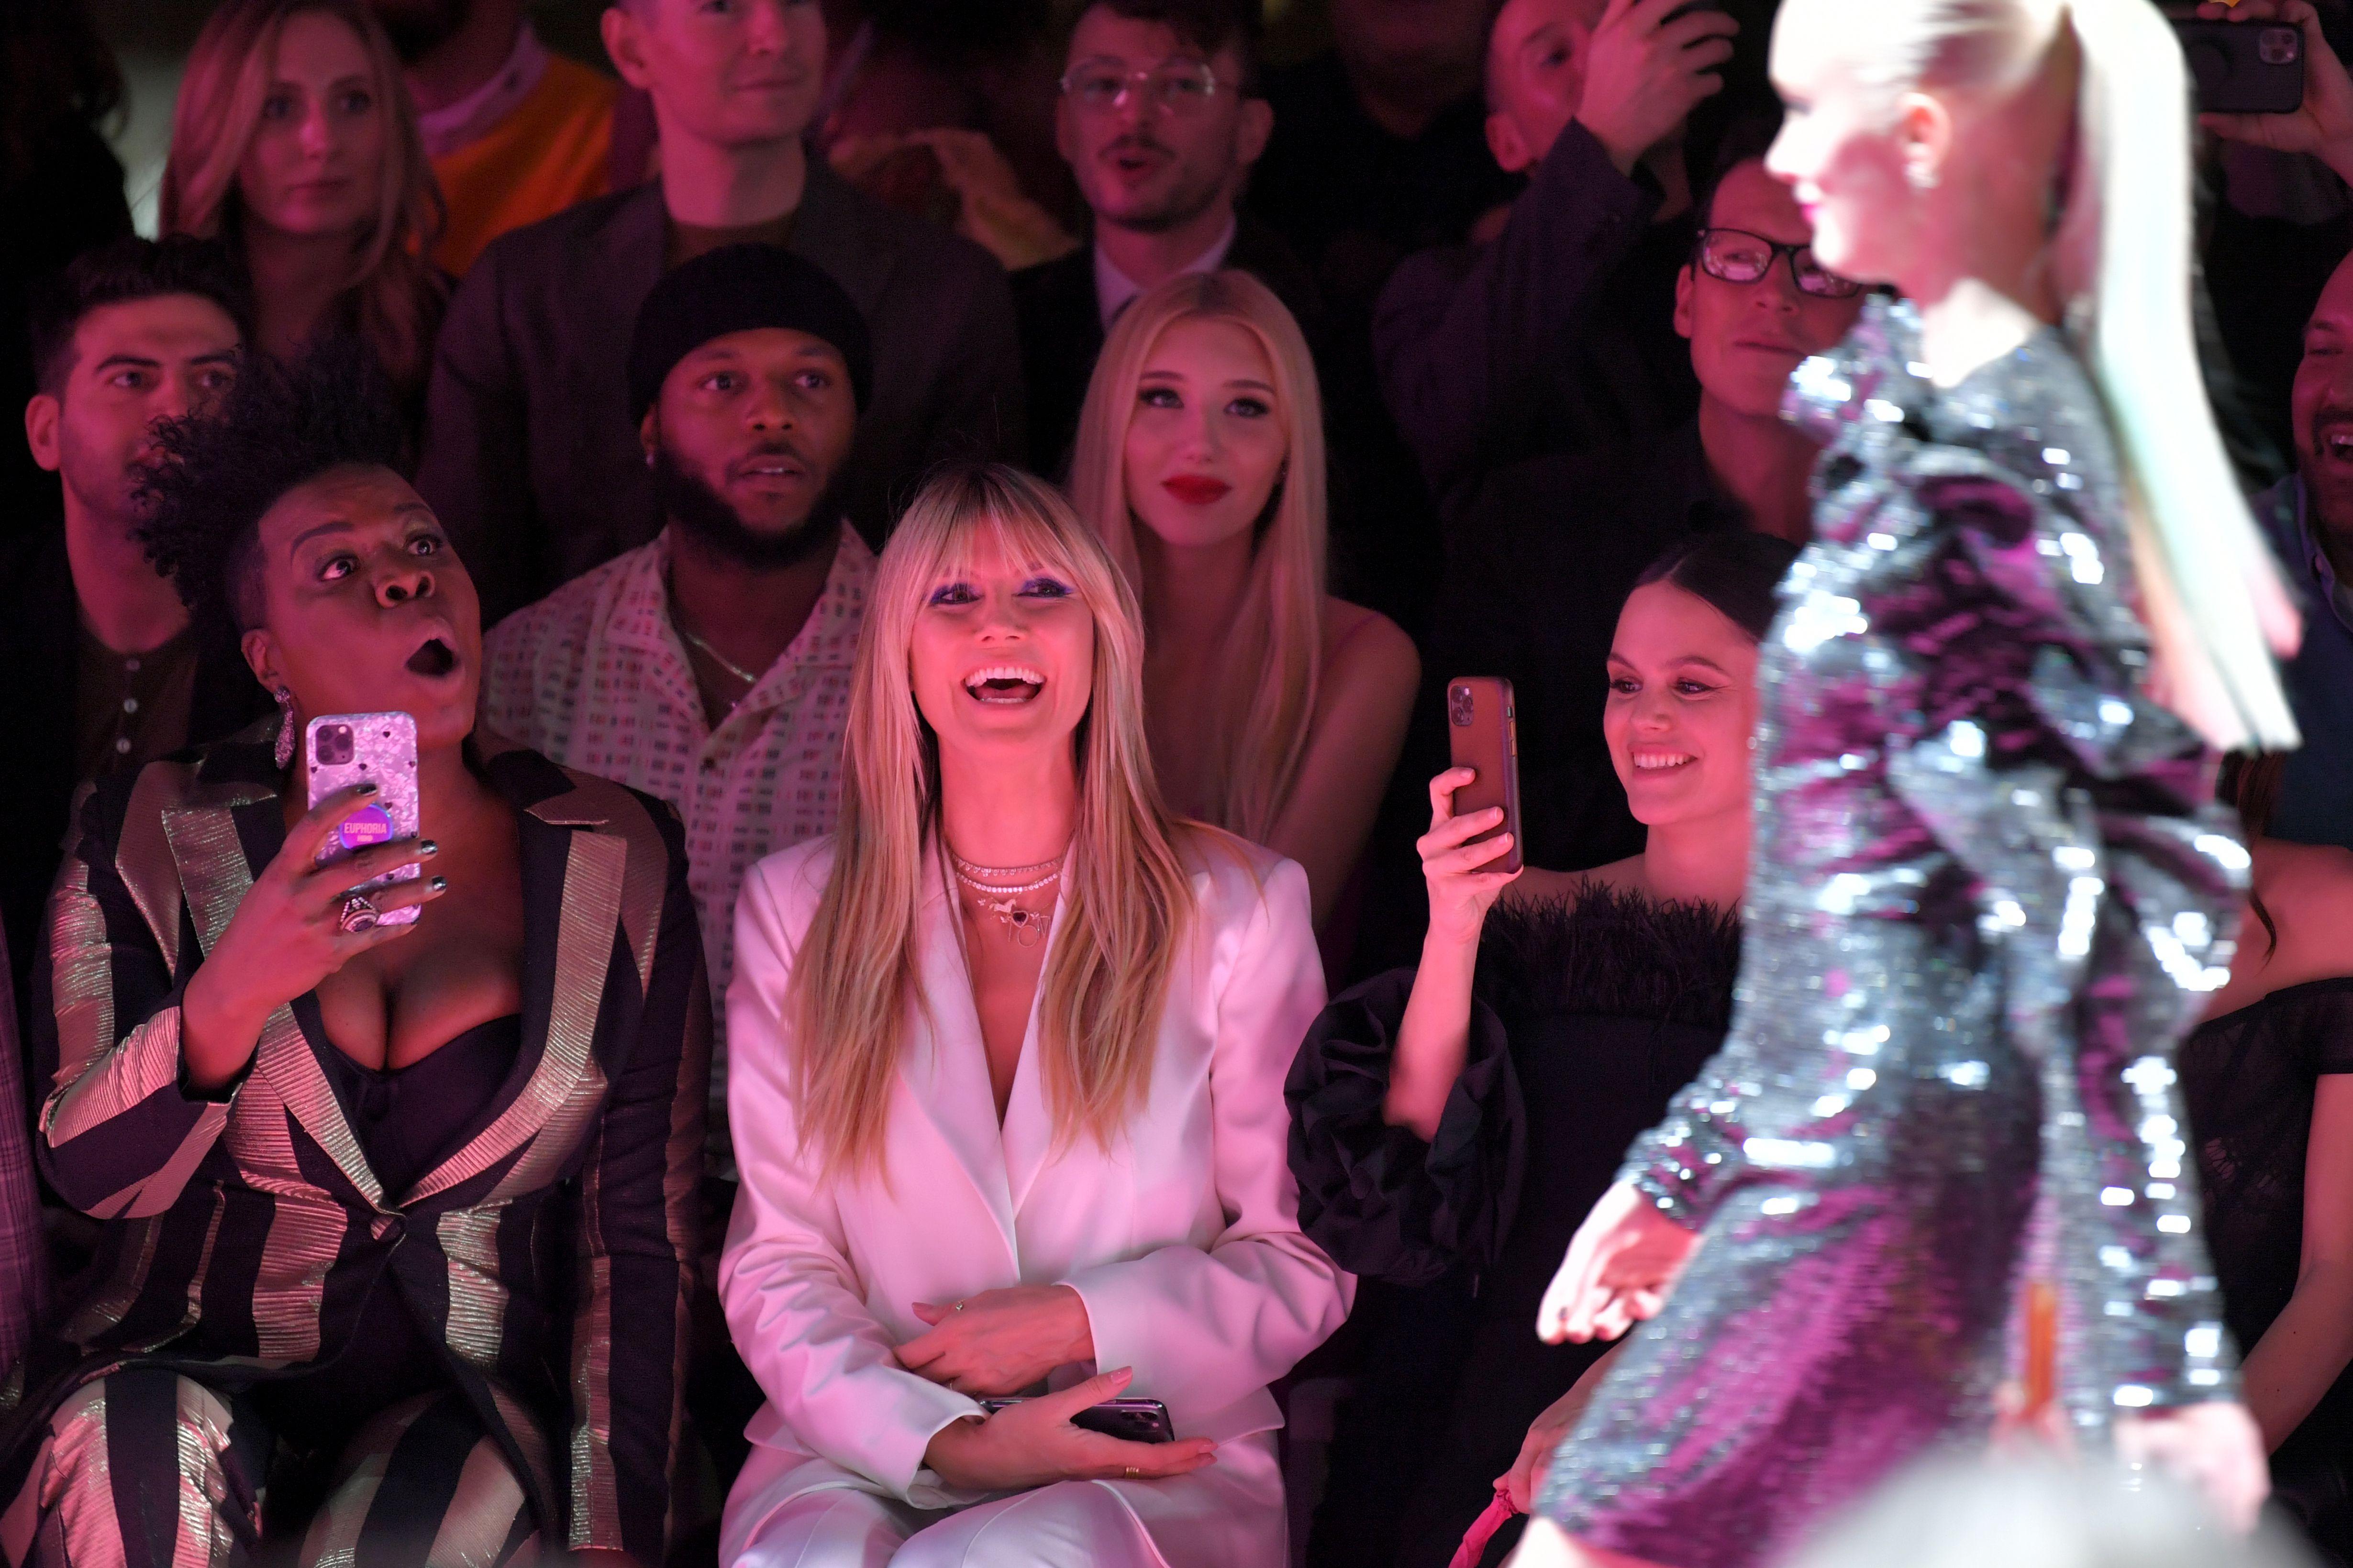 Leslie Jones, Heidi Klum, and Rachel Bilson in the front row Christian Siriano show